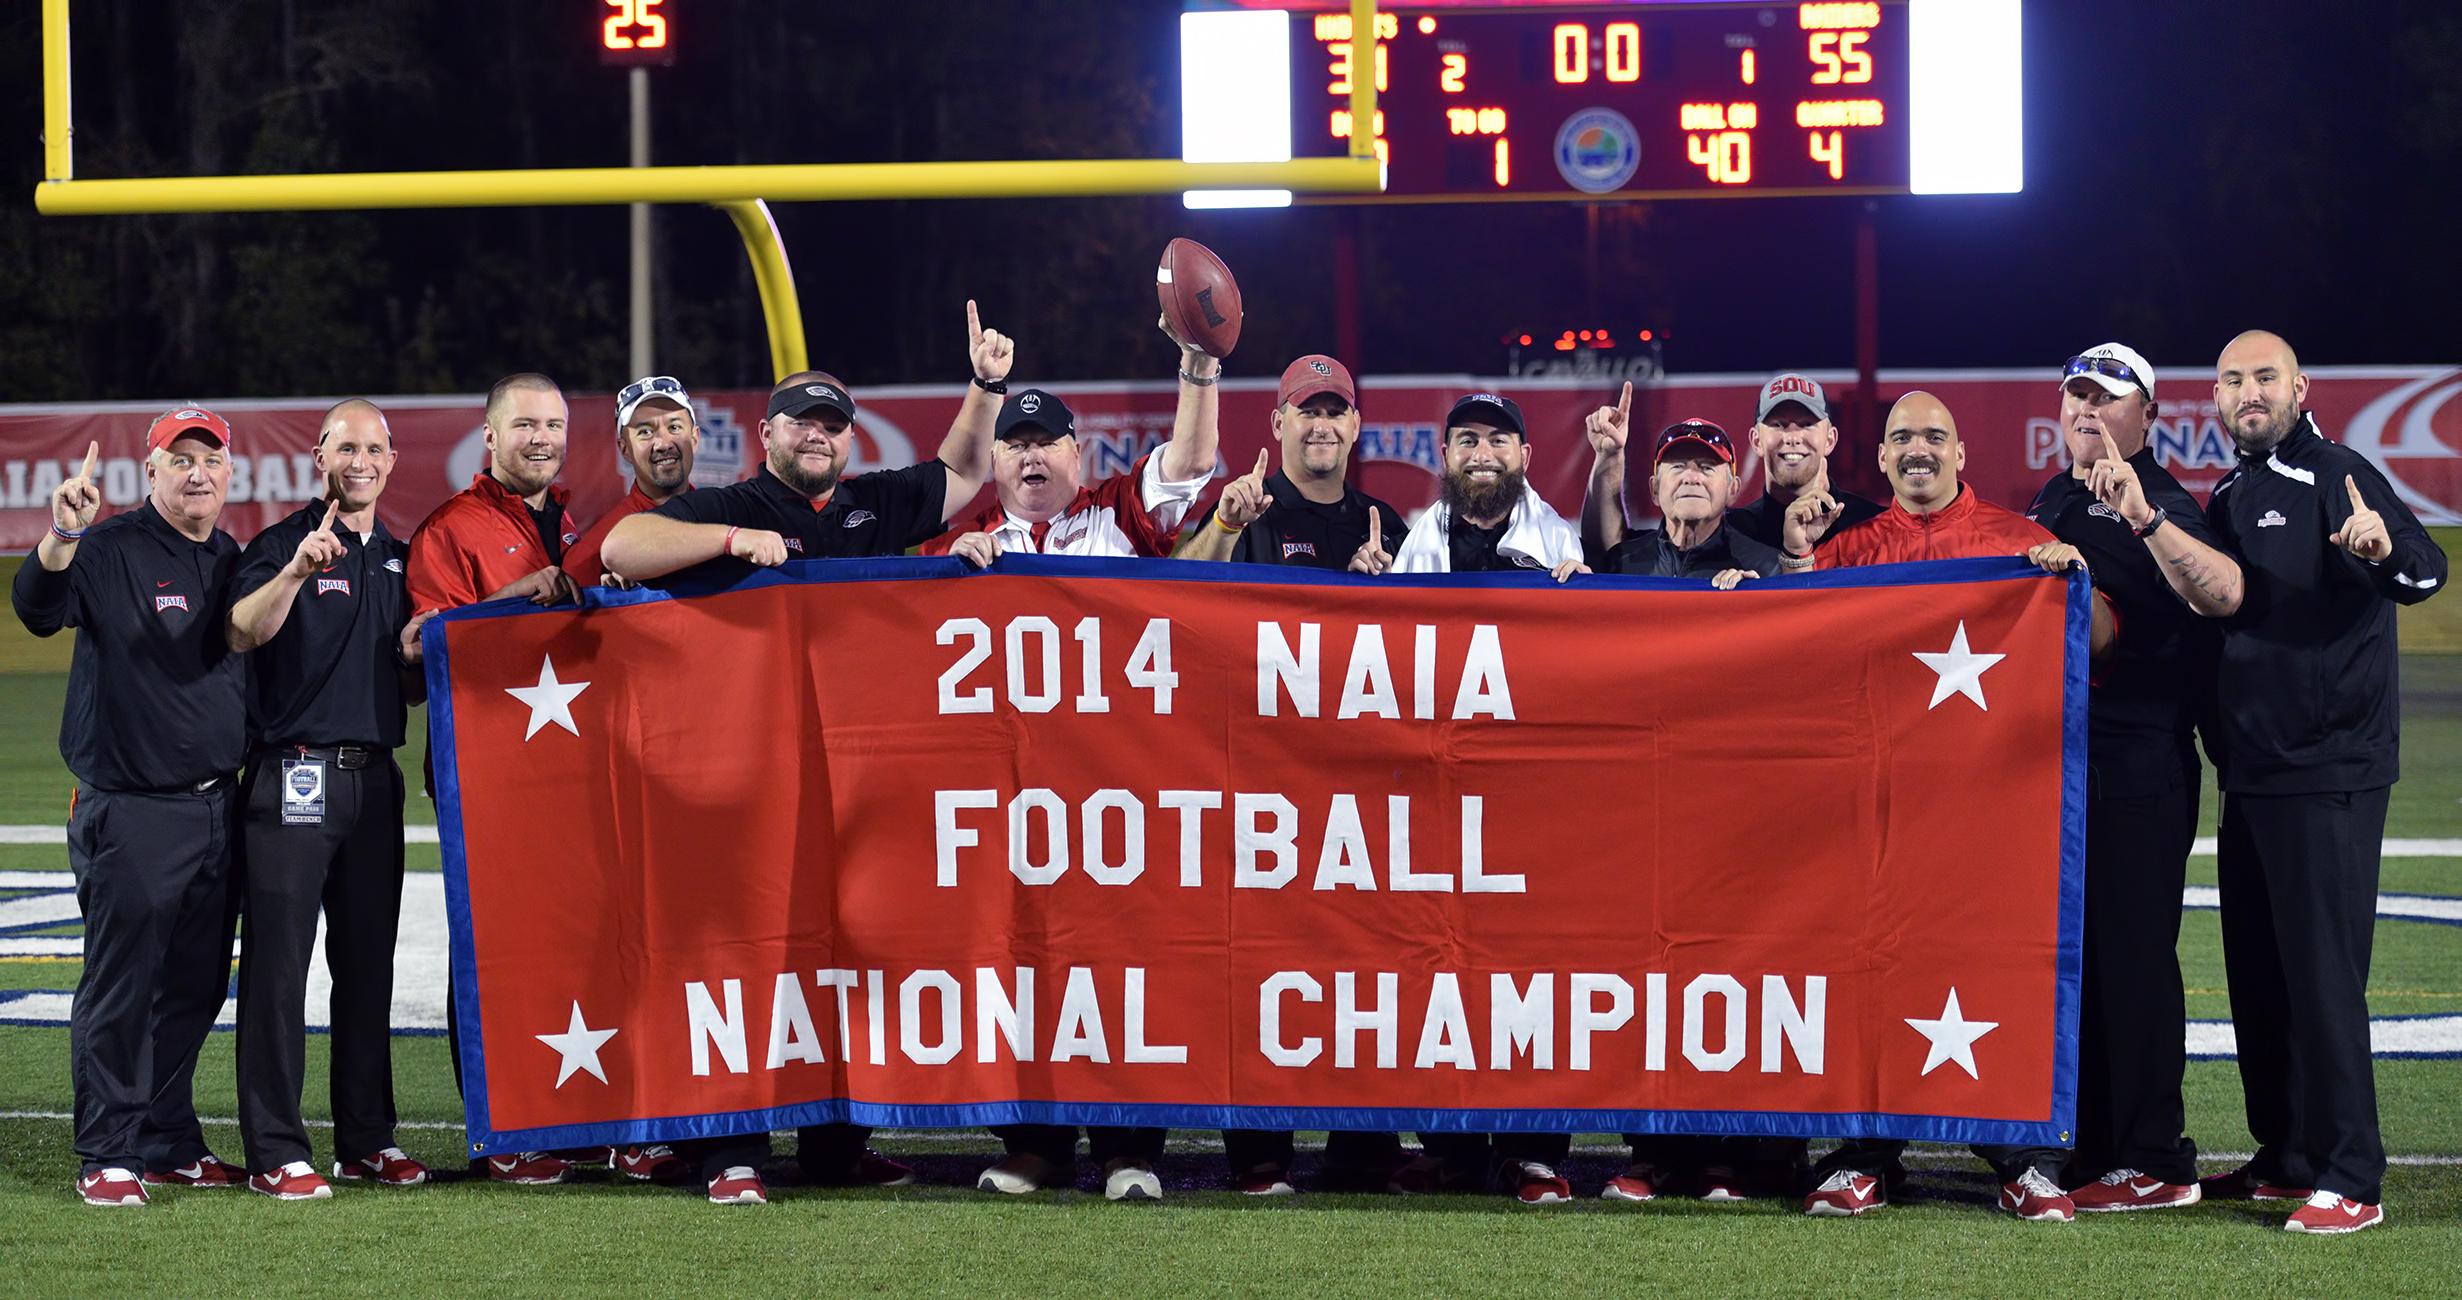 SOU football coaching staff national champion banner 2014 naia